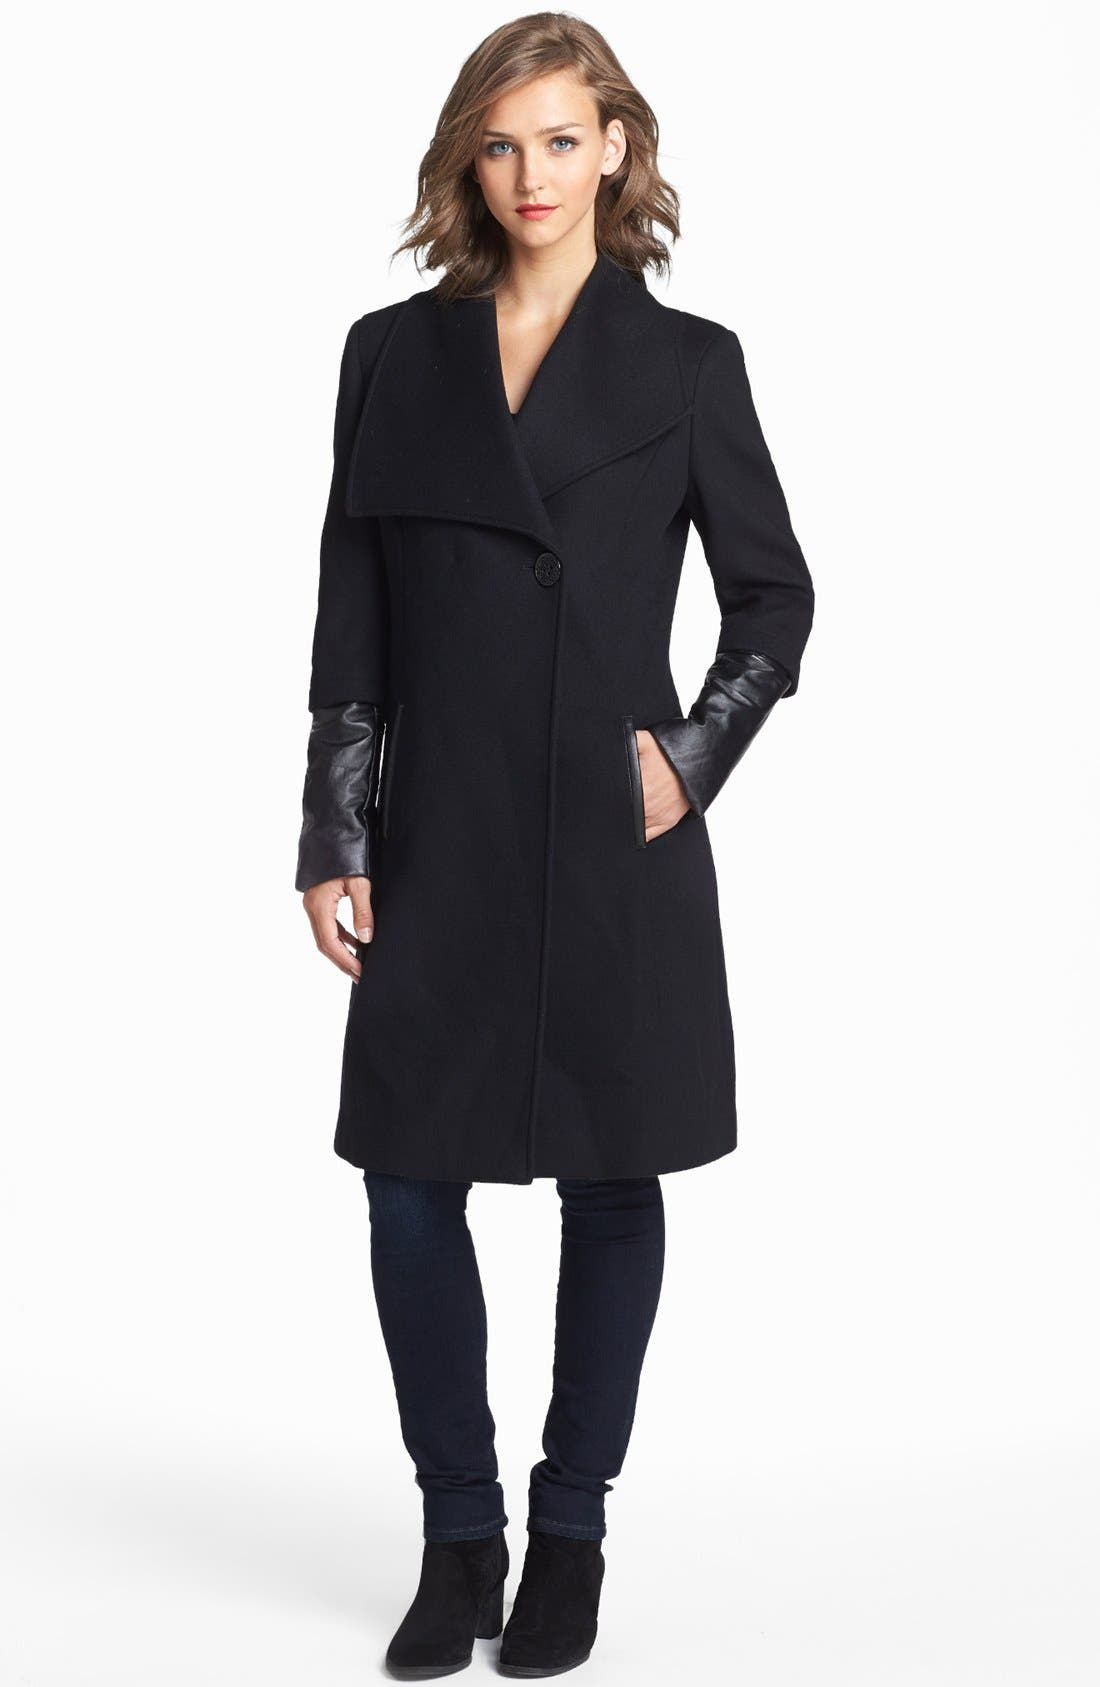 Main Image - Elie Tahari 'Carlotta' Leather Trim Wool Blend Coat